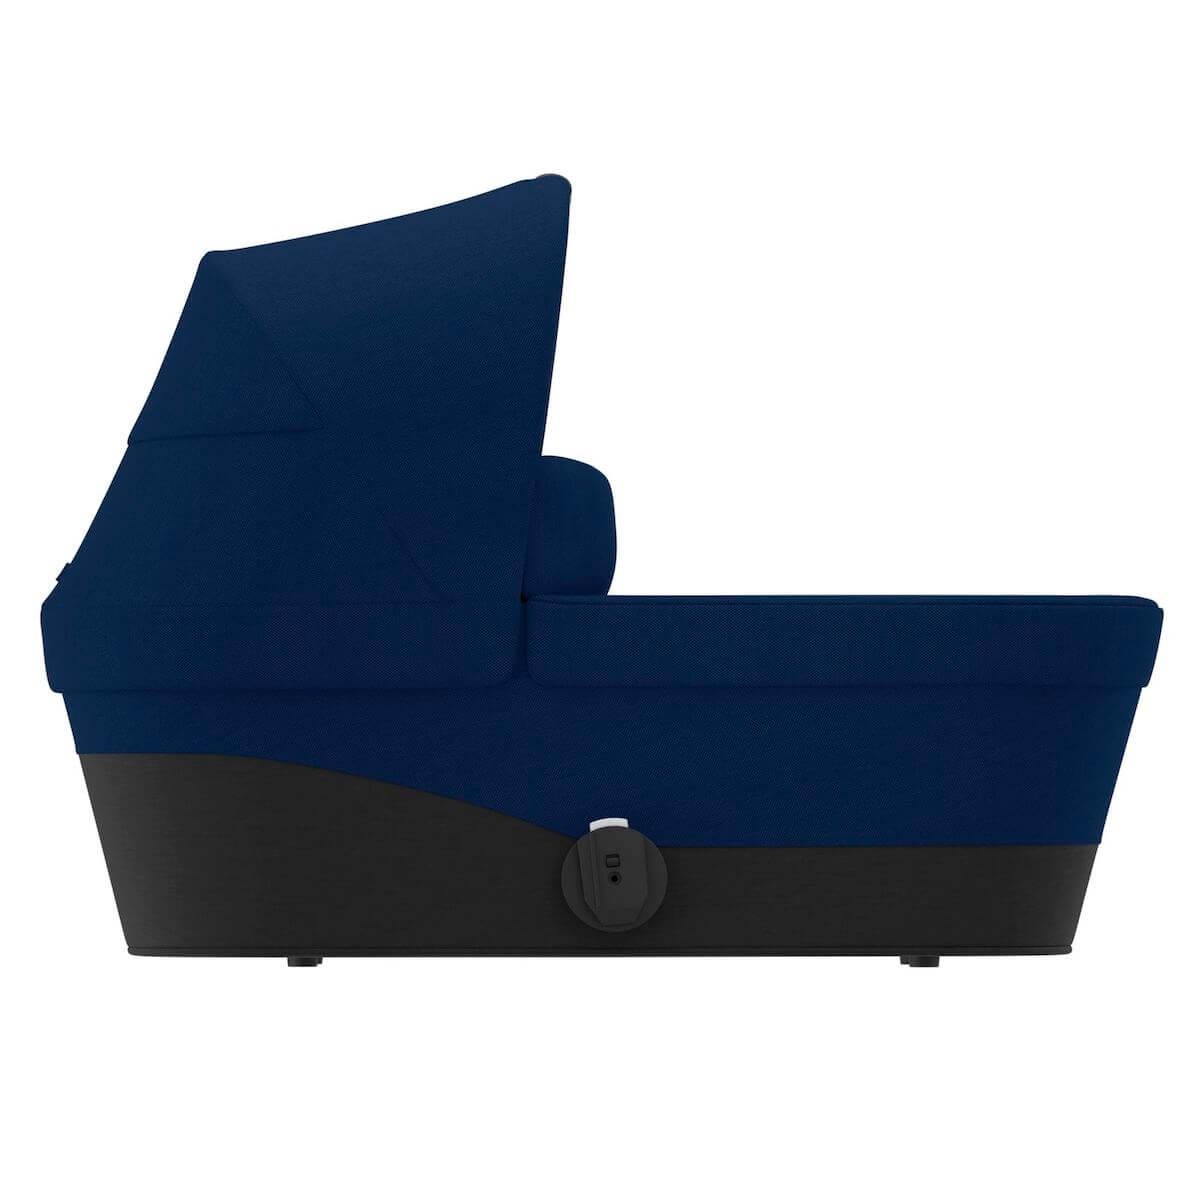 Capazo GAZELLE S Cybex Navy blue